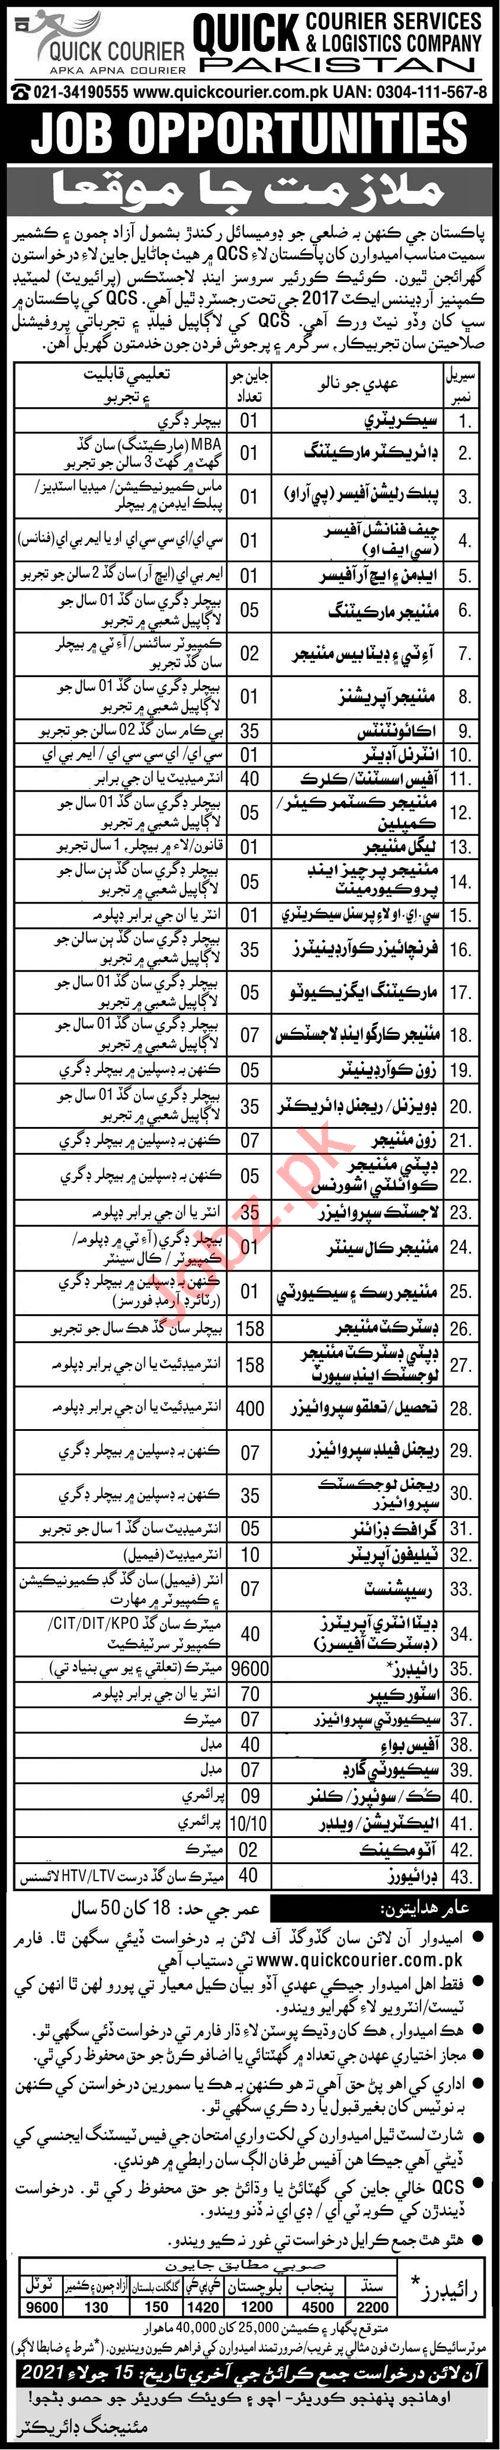 Quick Courier & Delivery Service Pakistan Jobs 2021